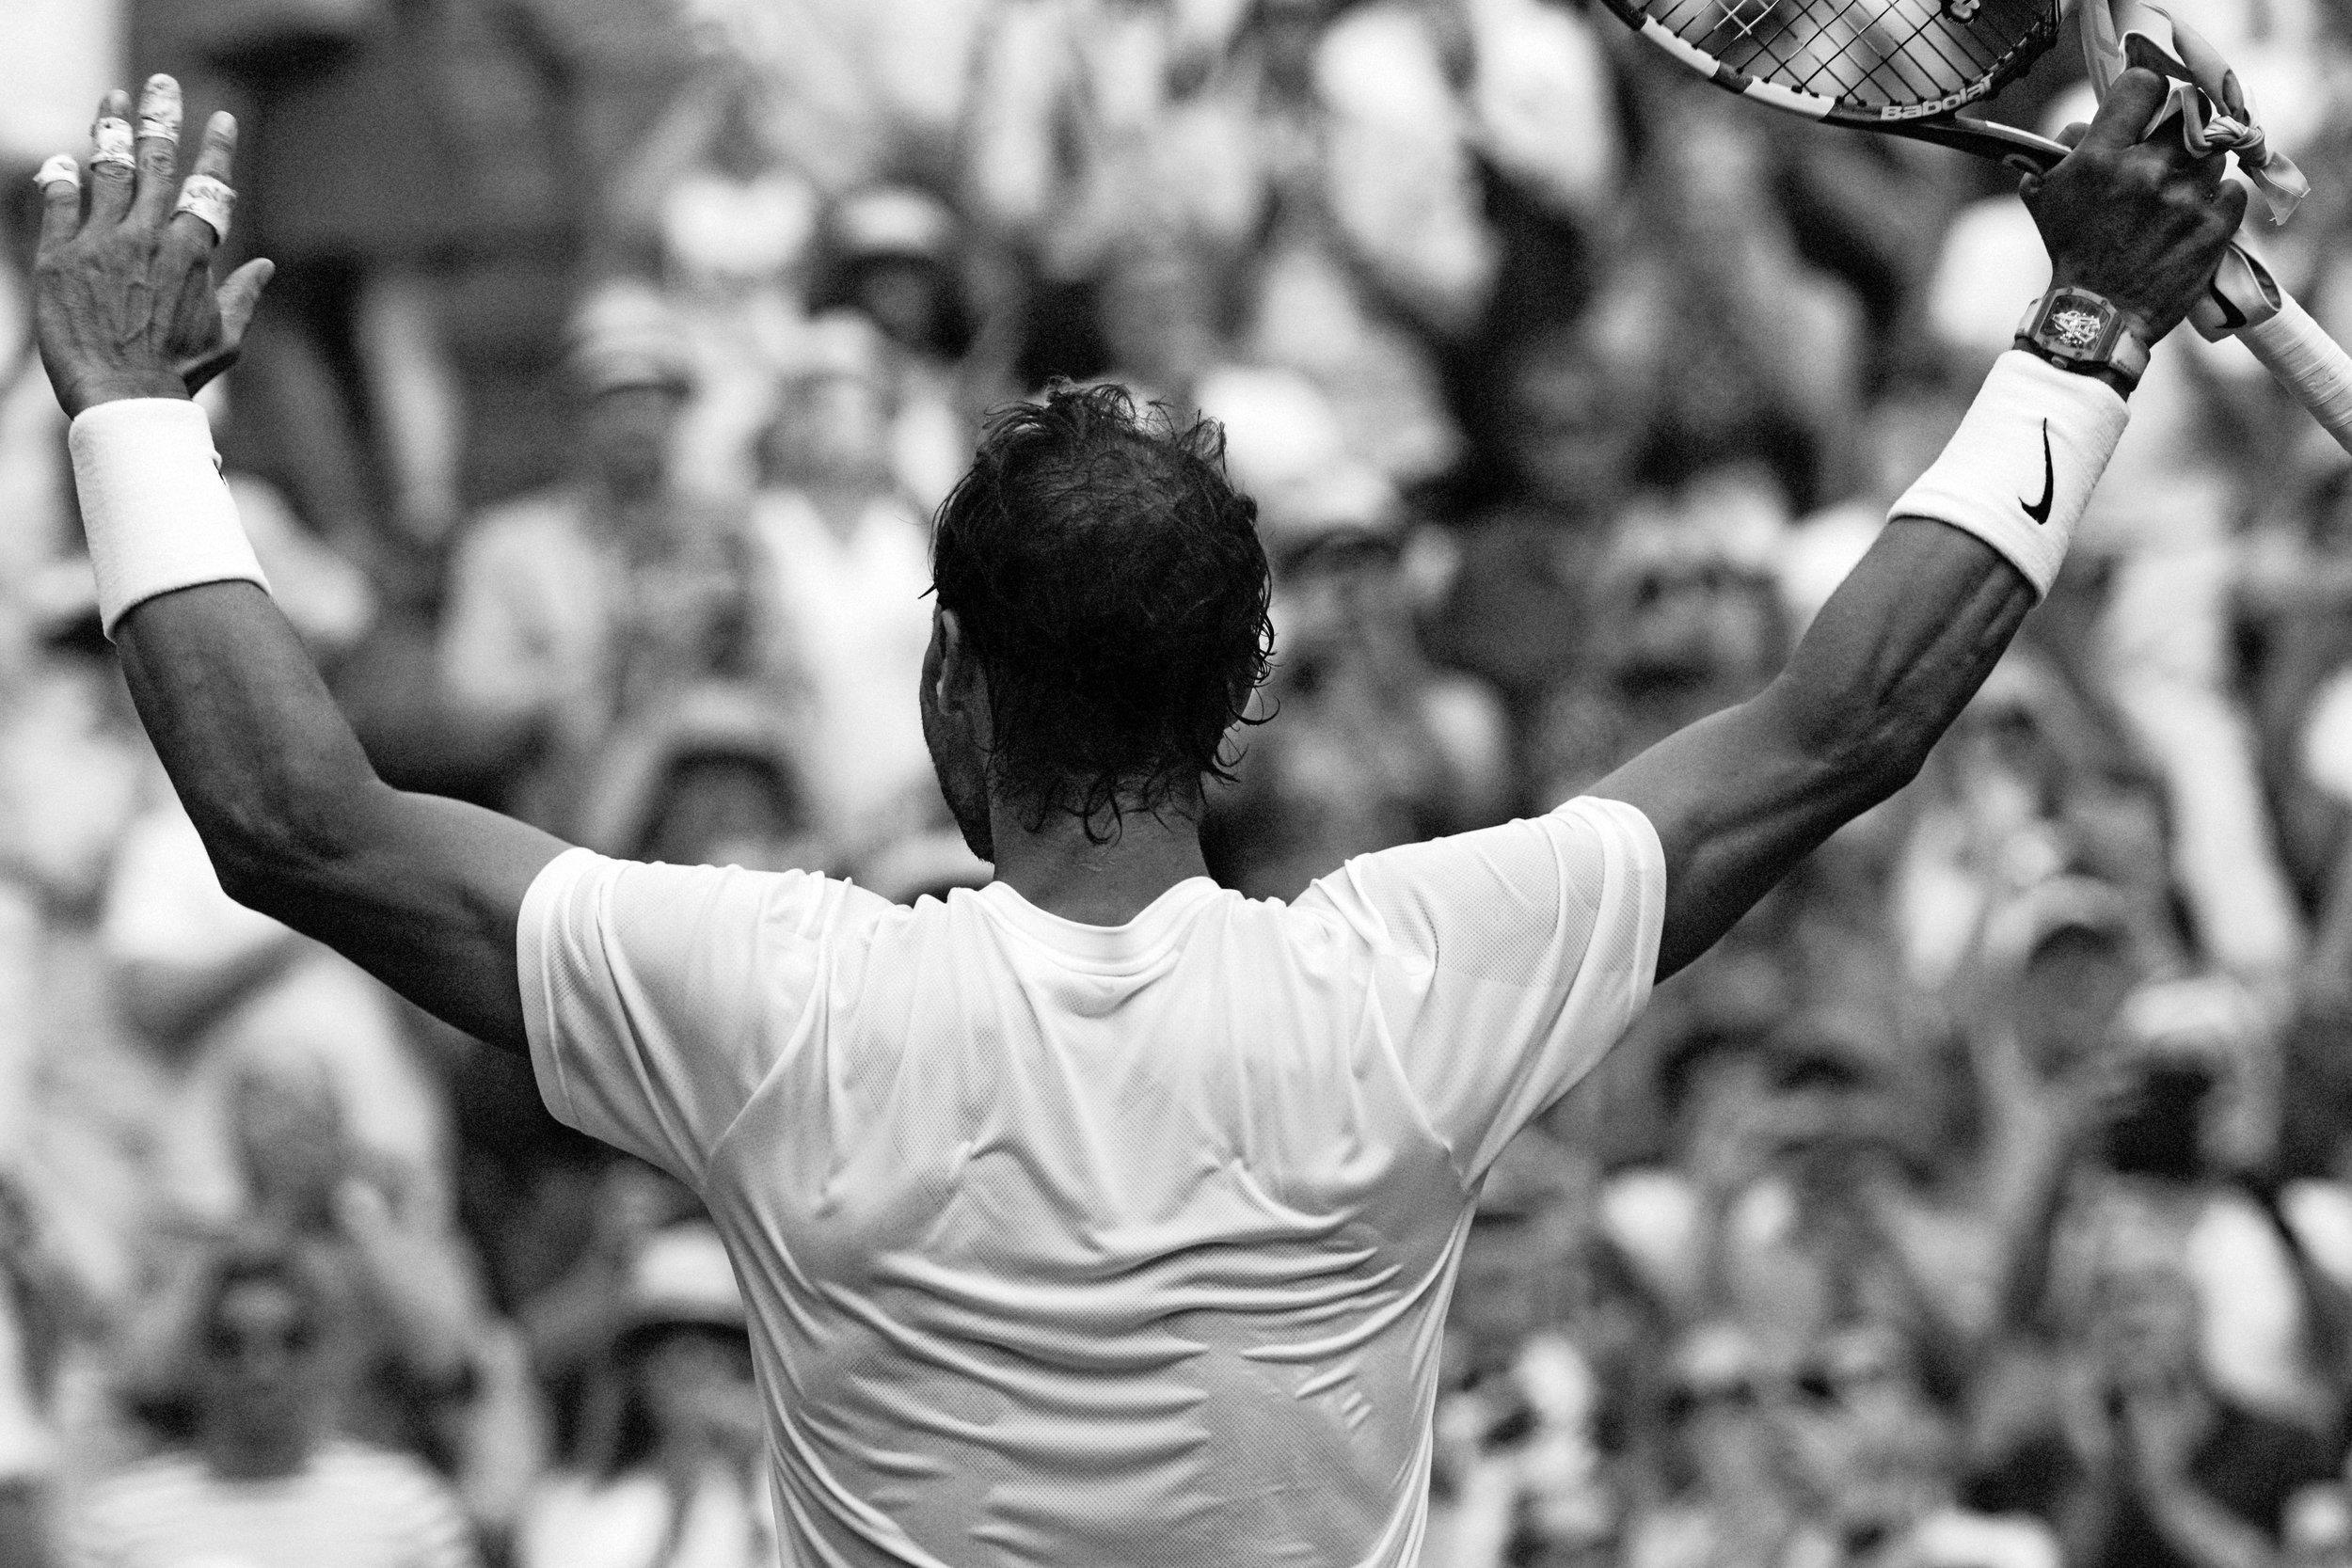 Wimbledon_New_York_Times_Stockdale43.jpg